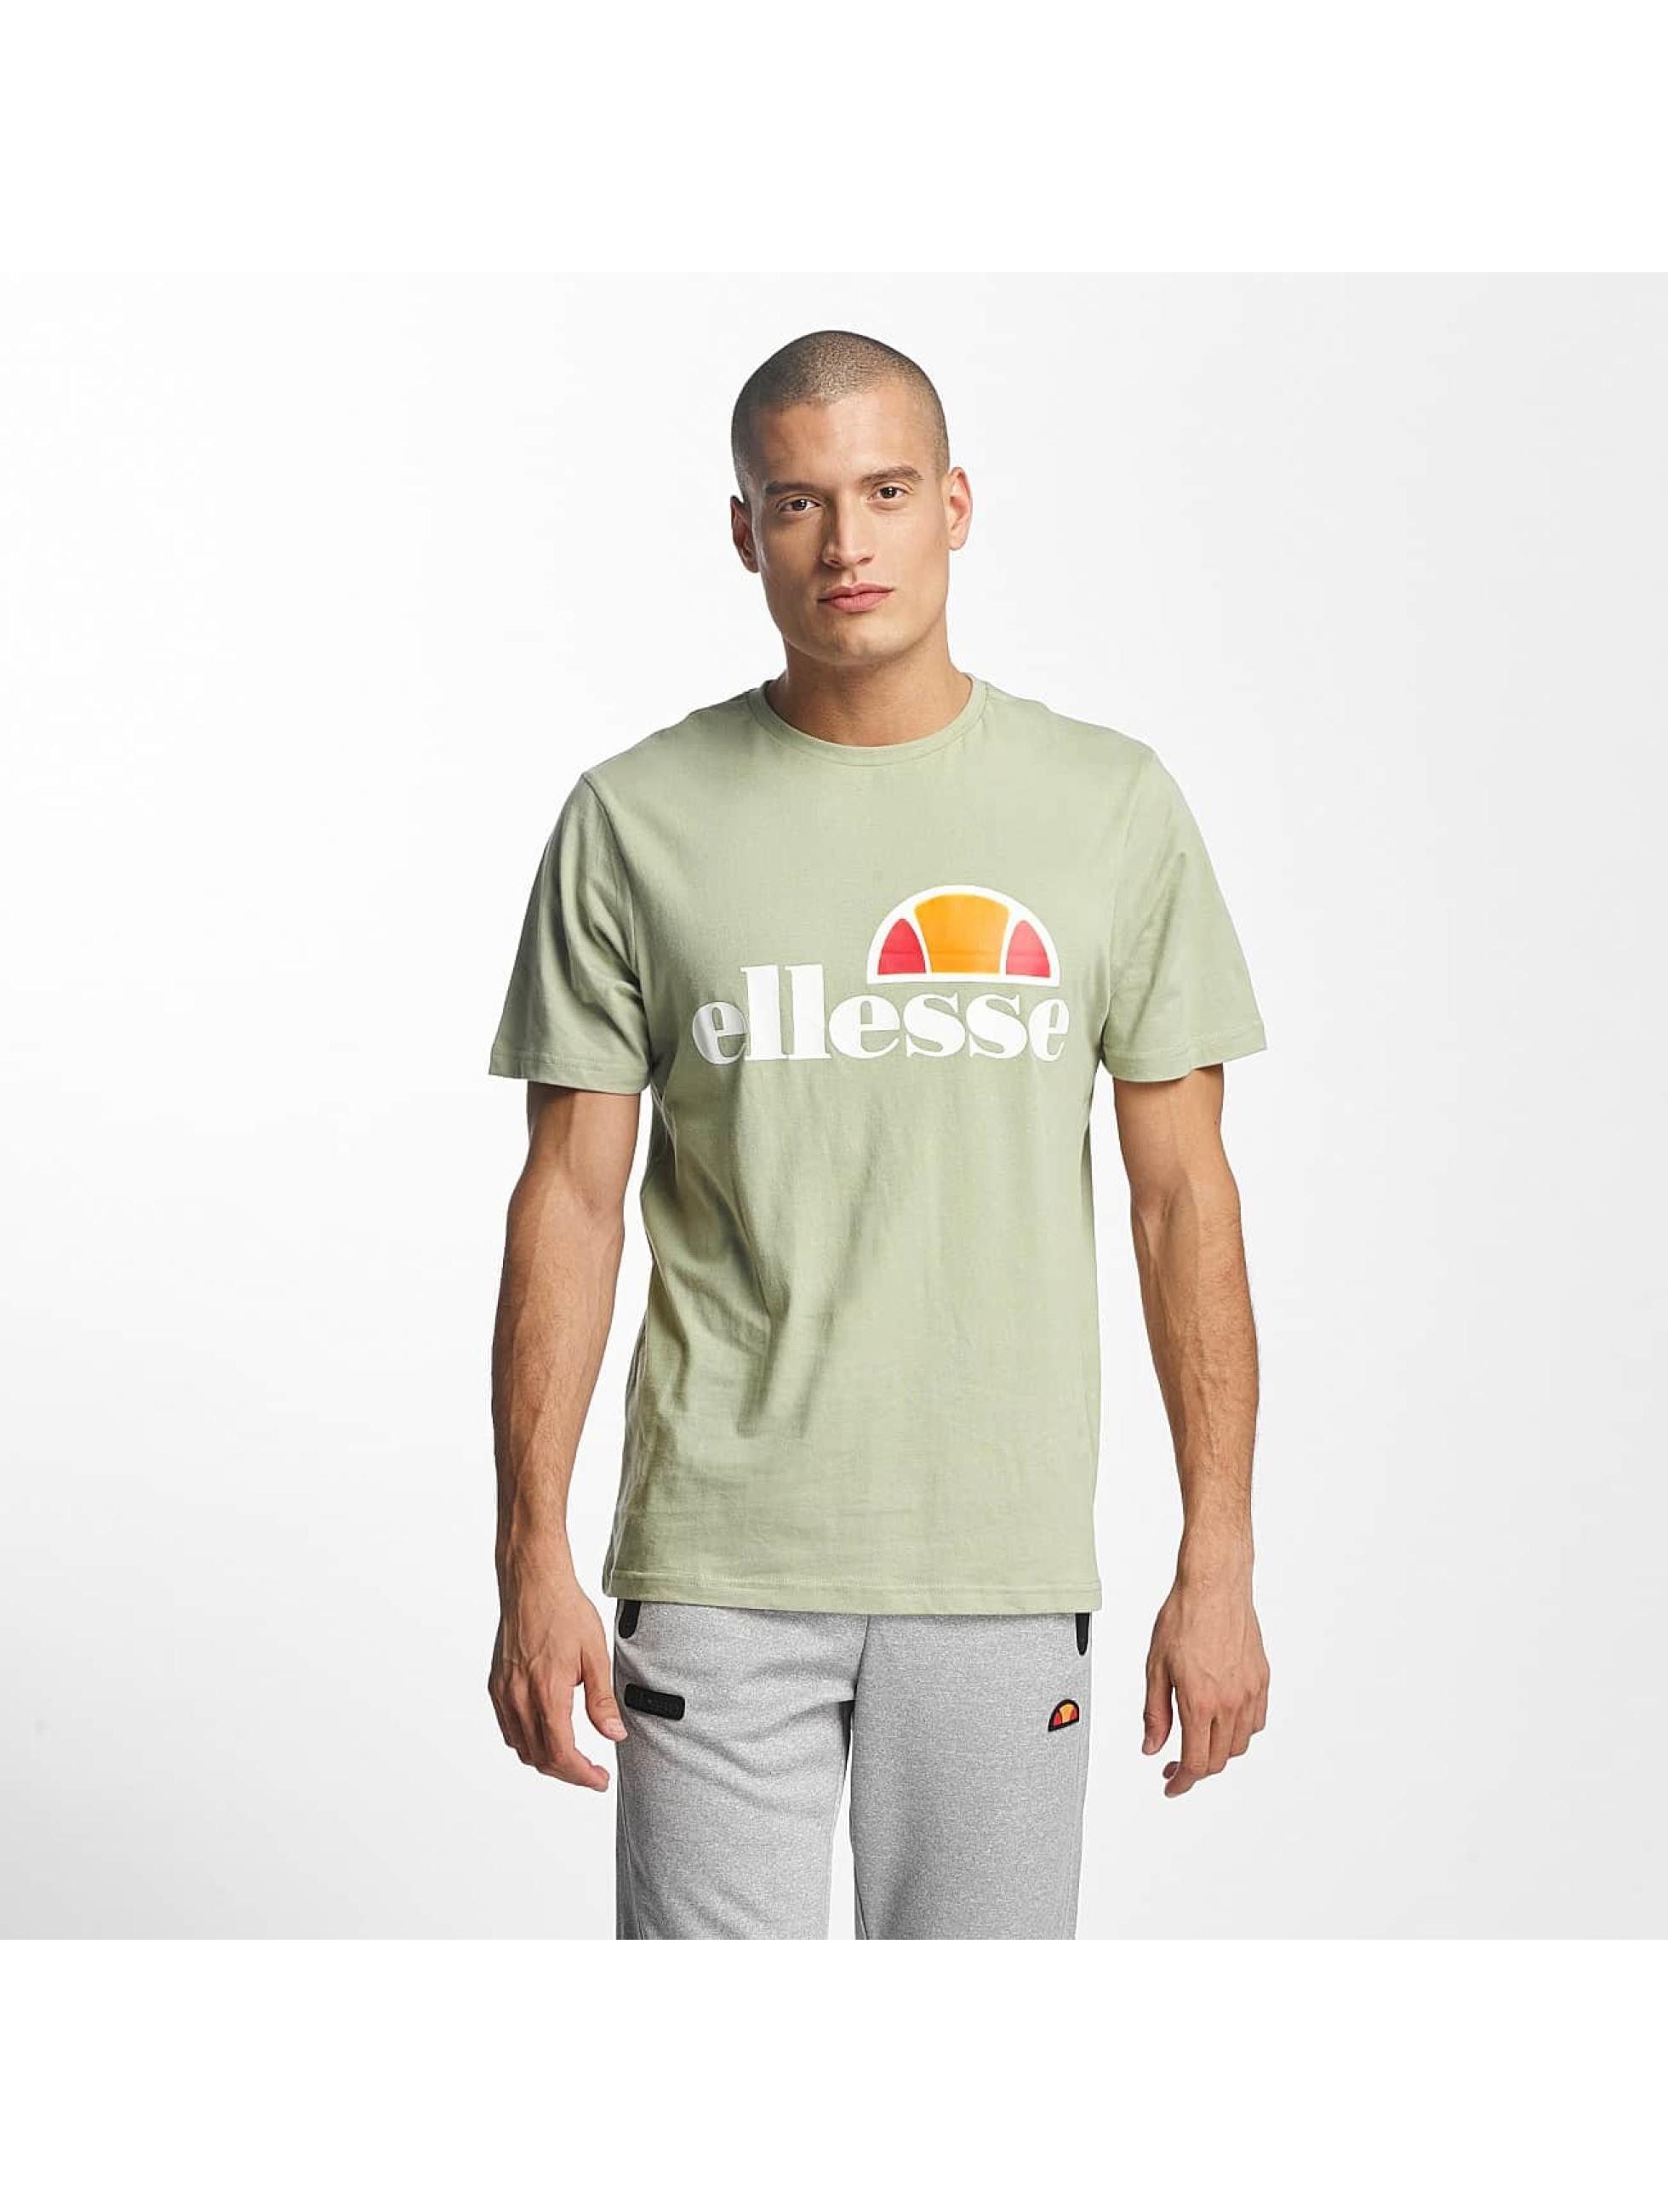 ellesse prado vert homme t shirt ellesse acheter pas cher haut 424020. Black Bedroom Furniture Sets. Home Design Ideas